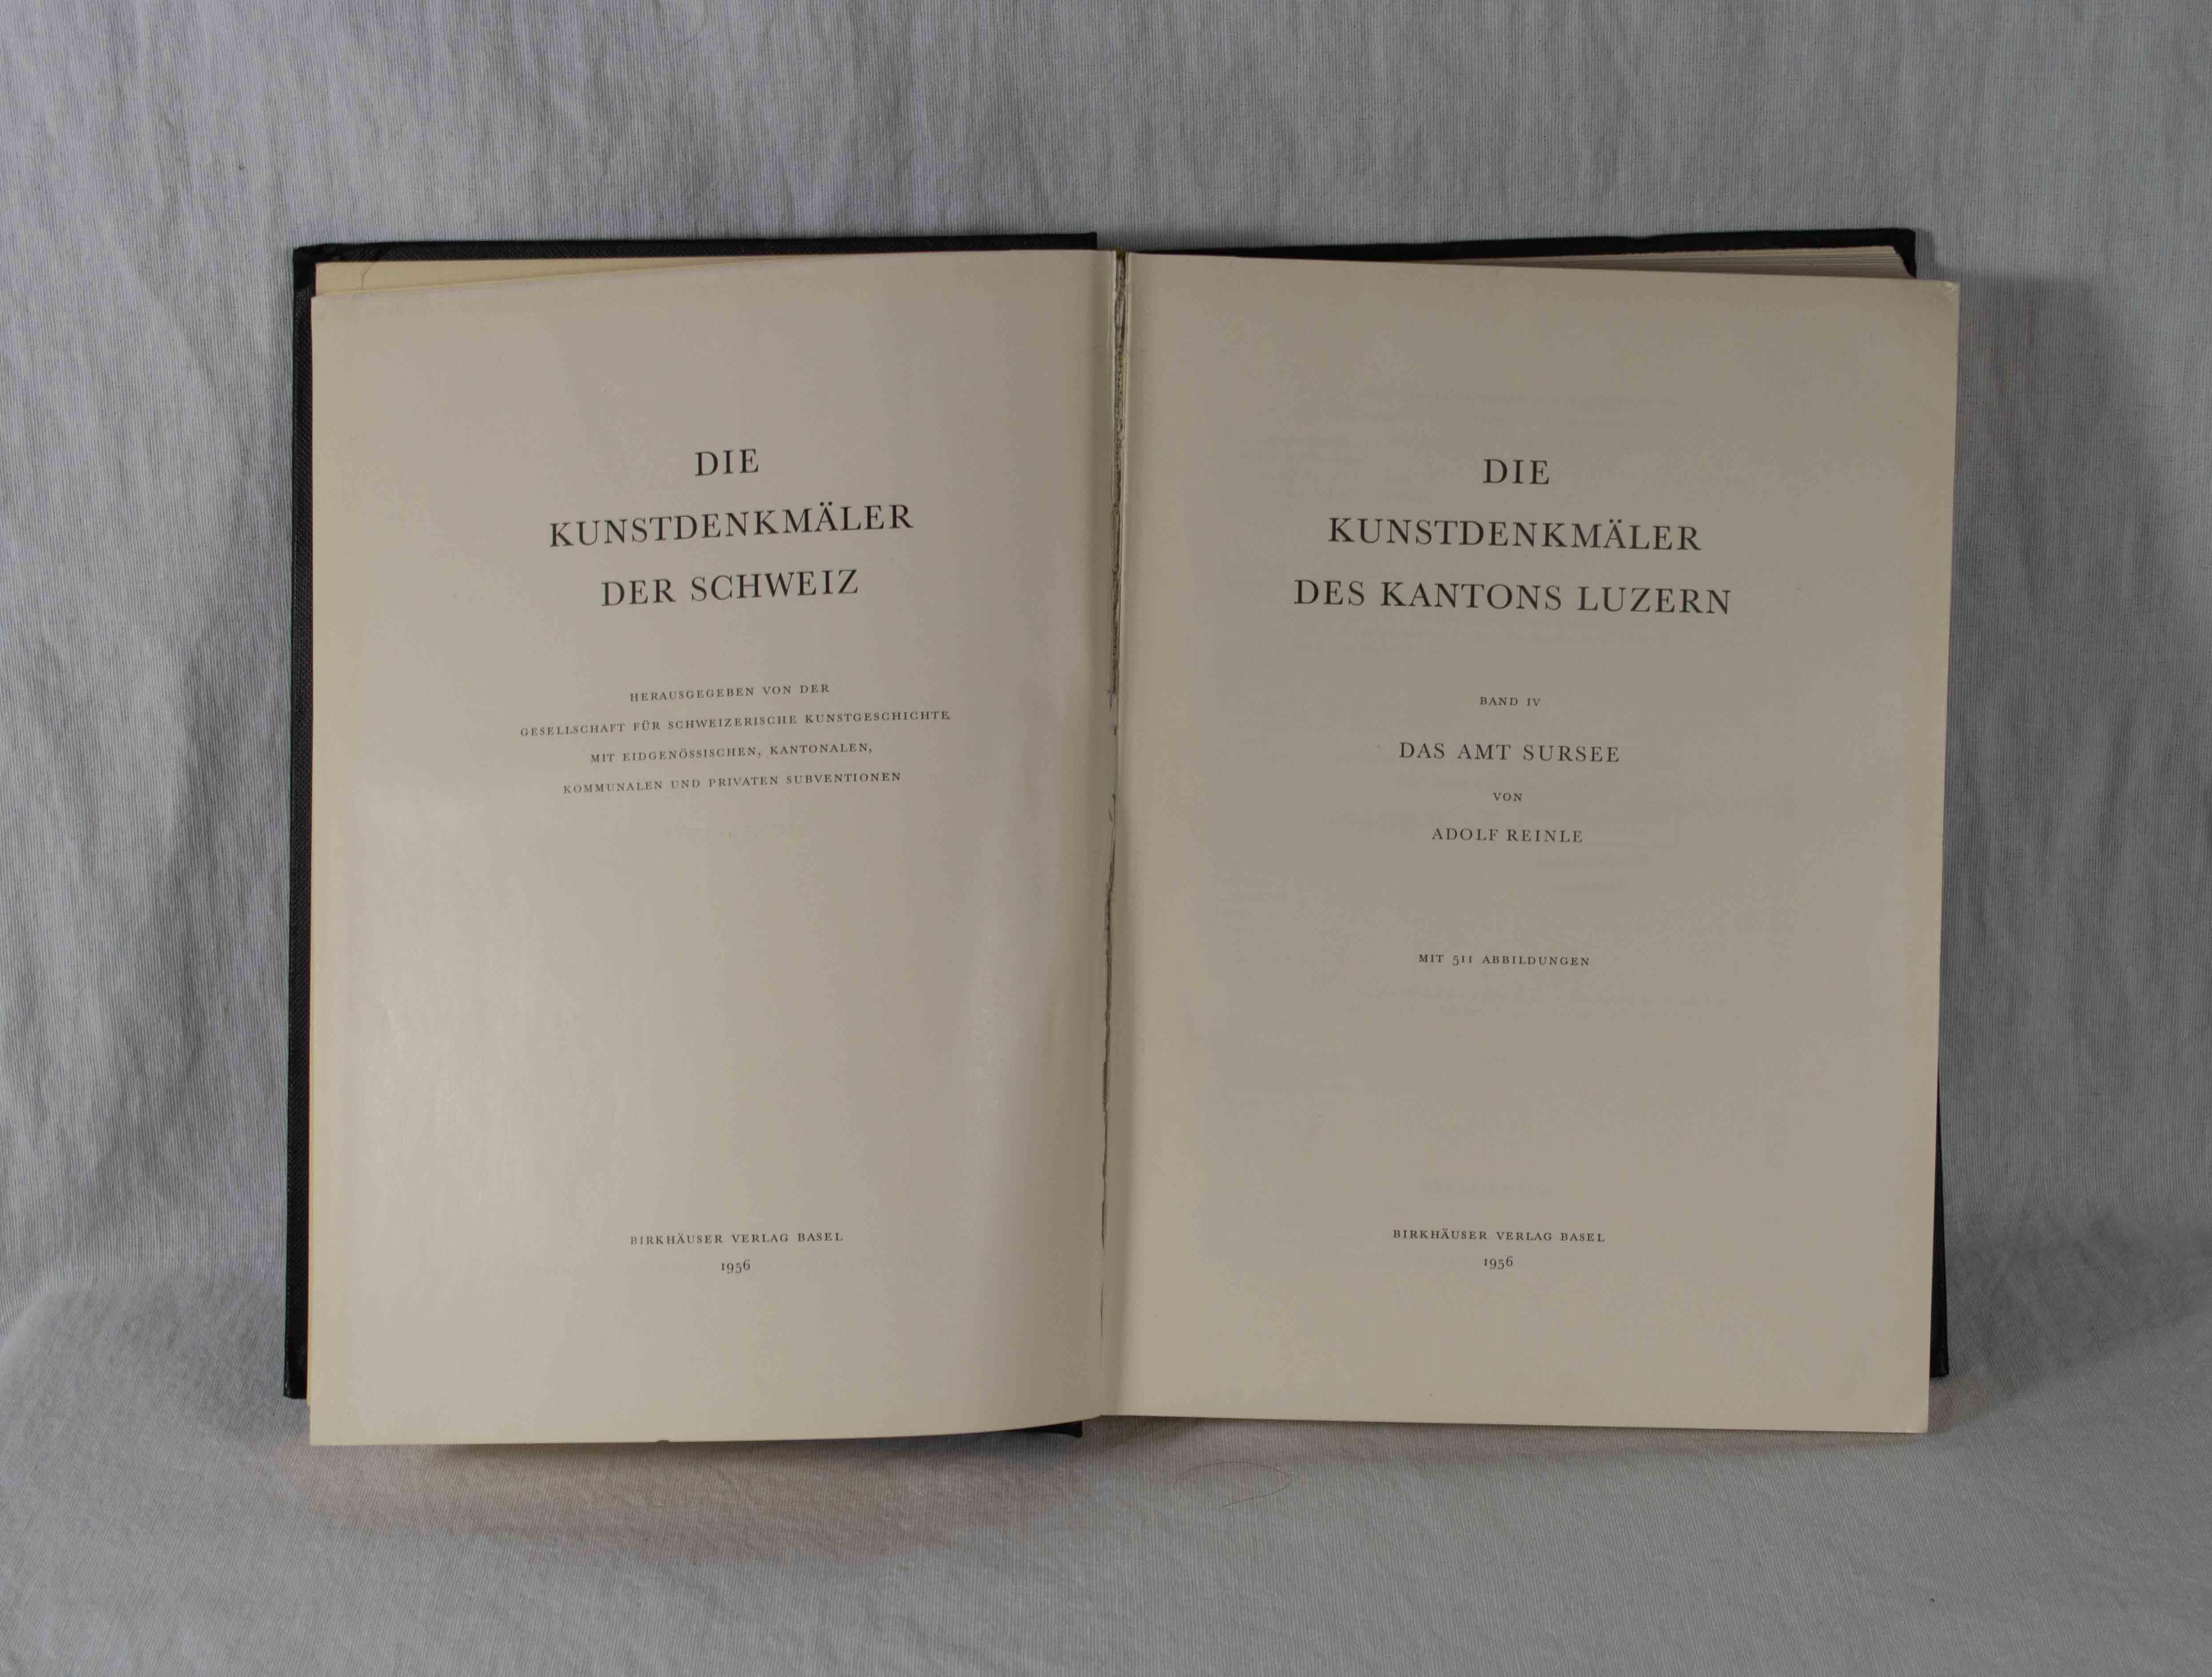 Die Kunstdenkmäler des Kantons Luzern, Band IV: Reinle, Adolf: